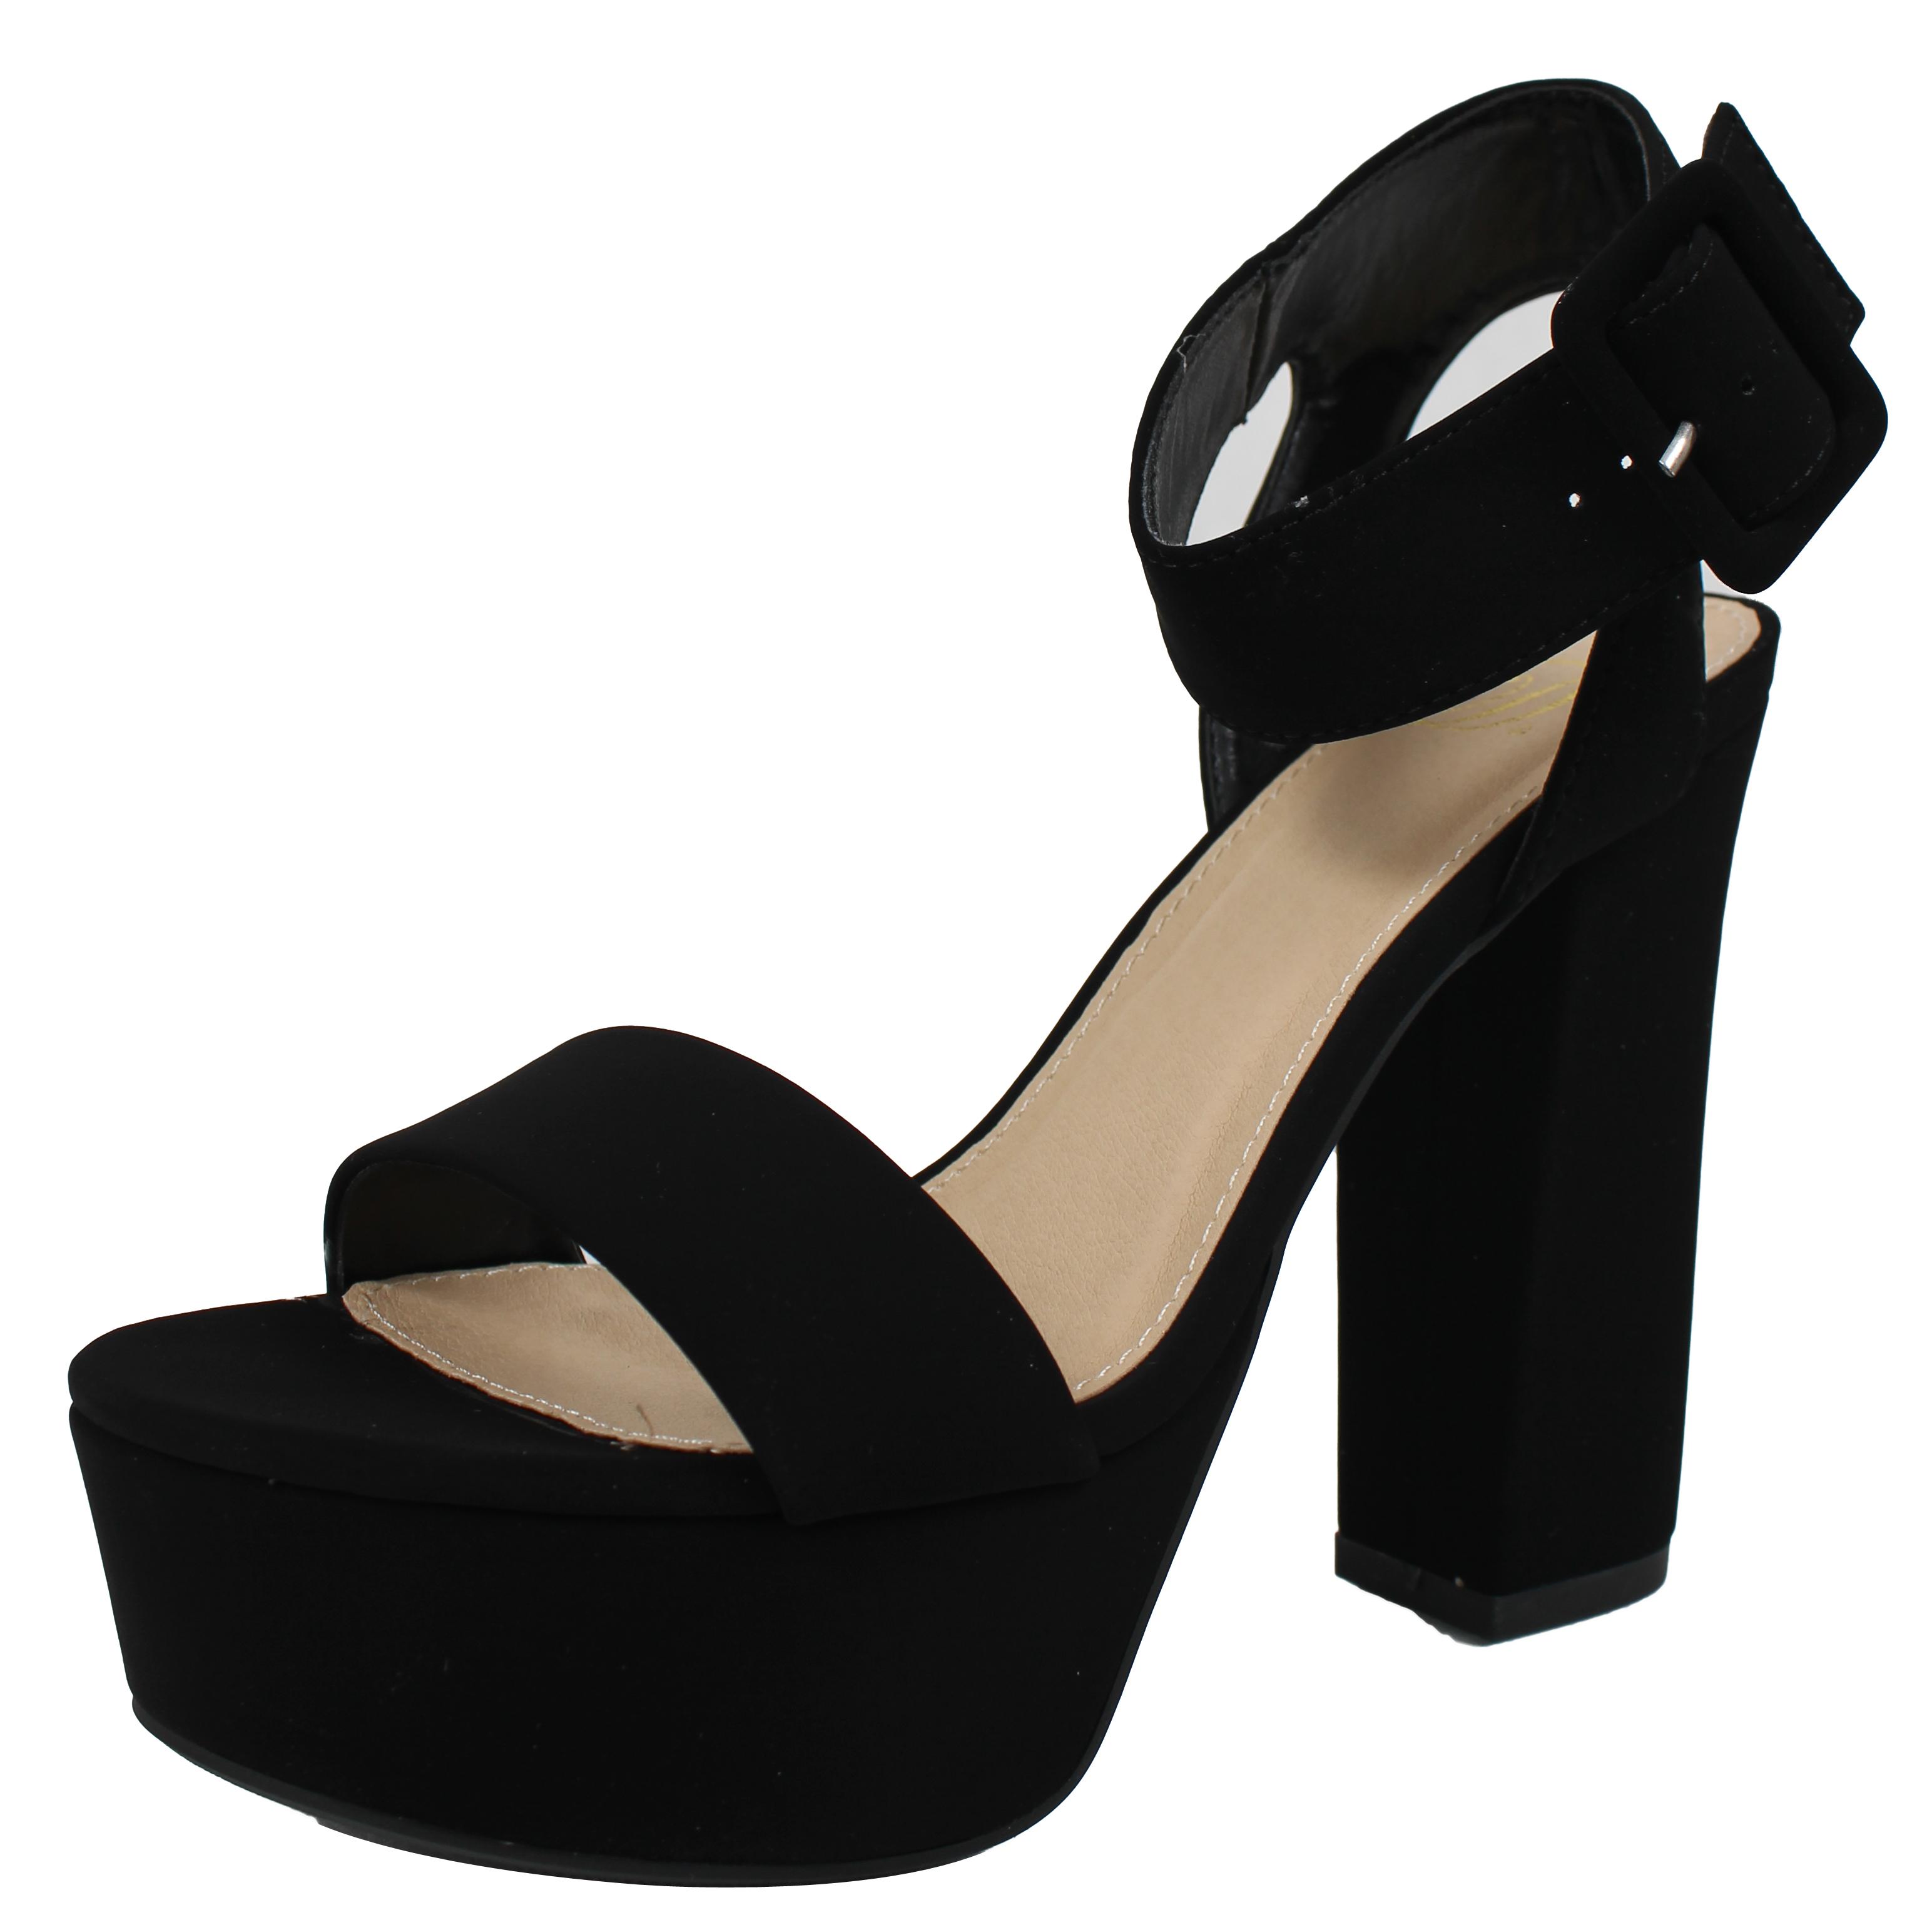 eaa6c17e210 Delicious - Delicious Women s Open Toe Thick Wide Strap Ankle Strap Block  Heel Sandal (Black